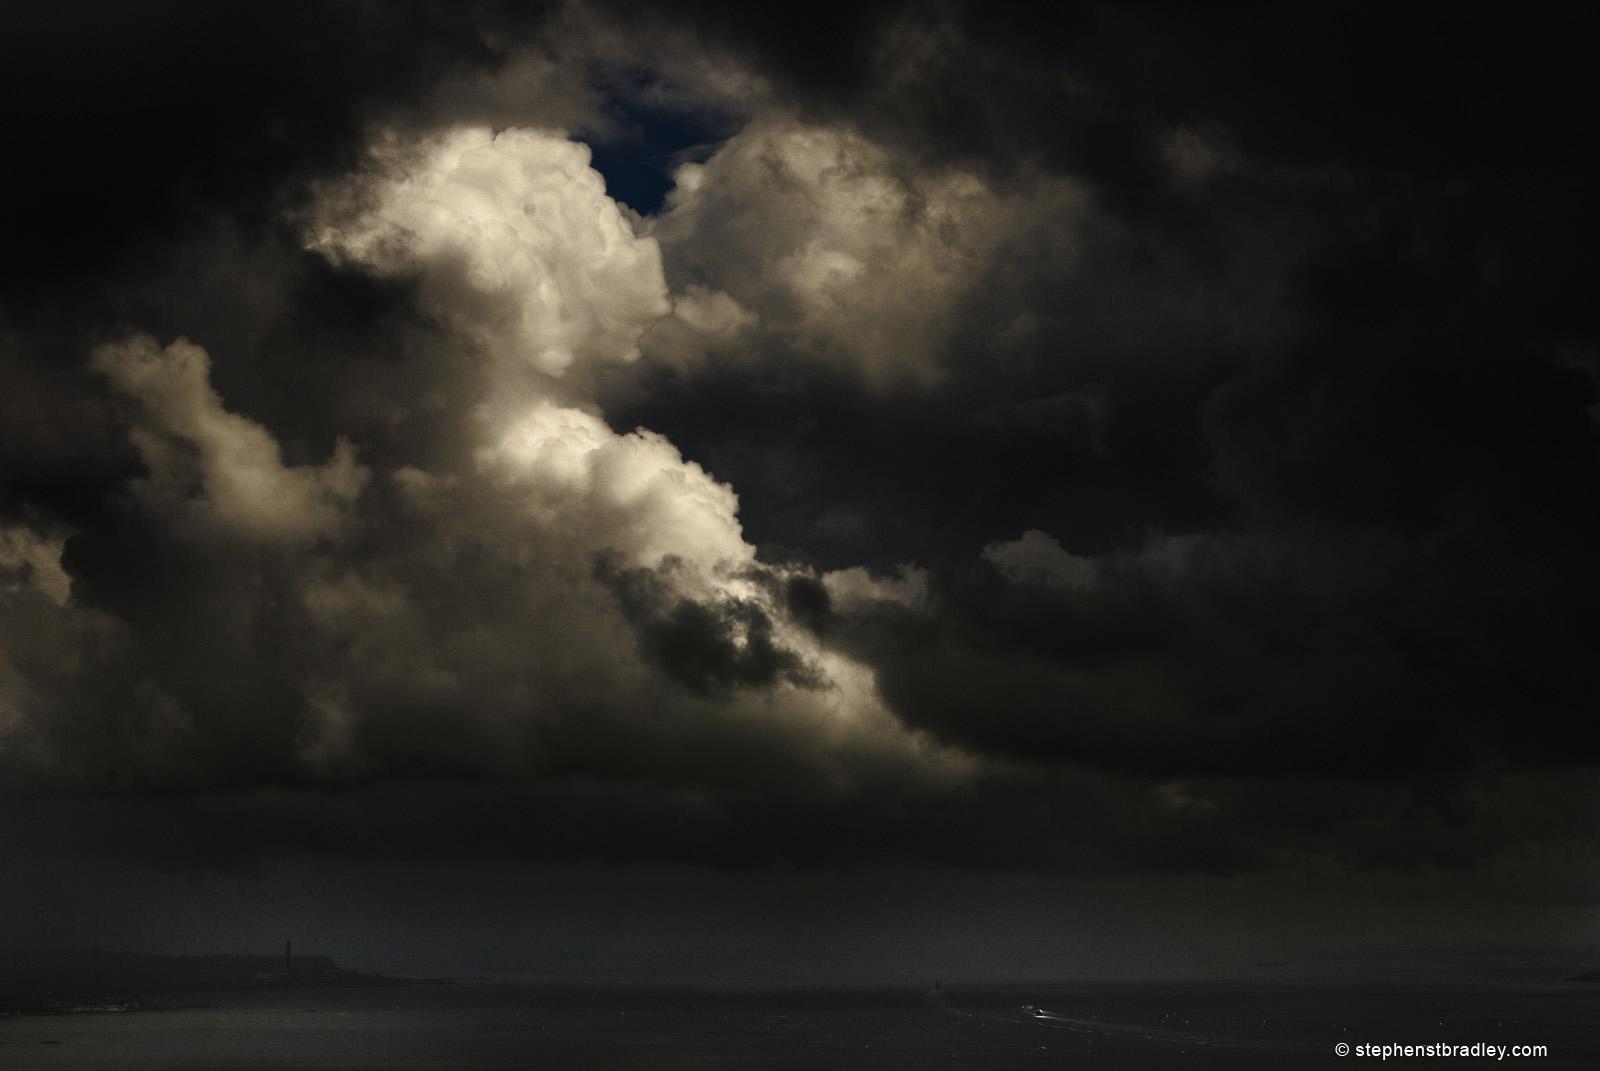 Belfast Lough beneath dramatic sky by Stephen Bradley, fine art photo 2658.